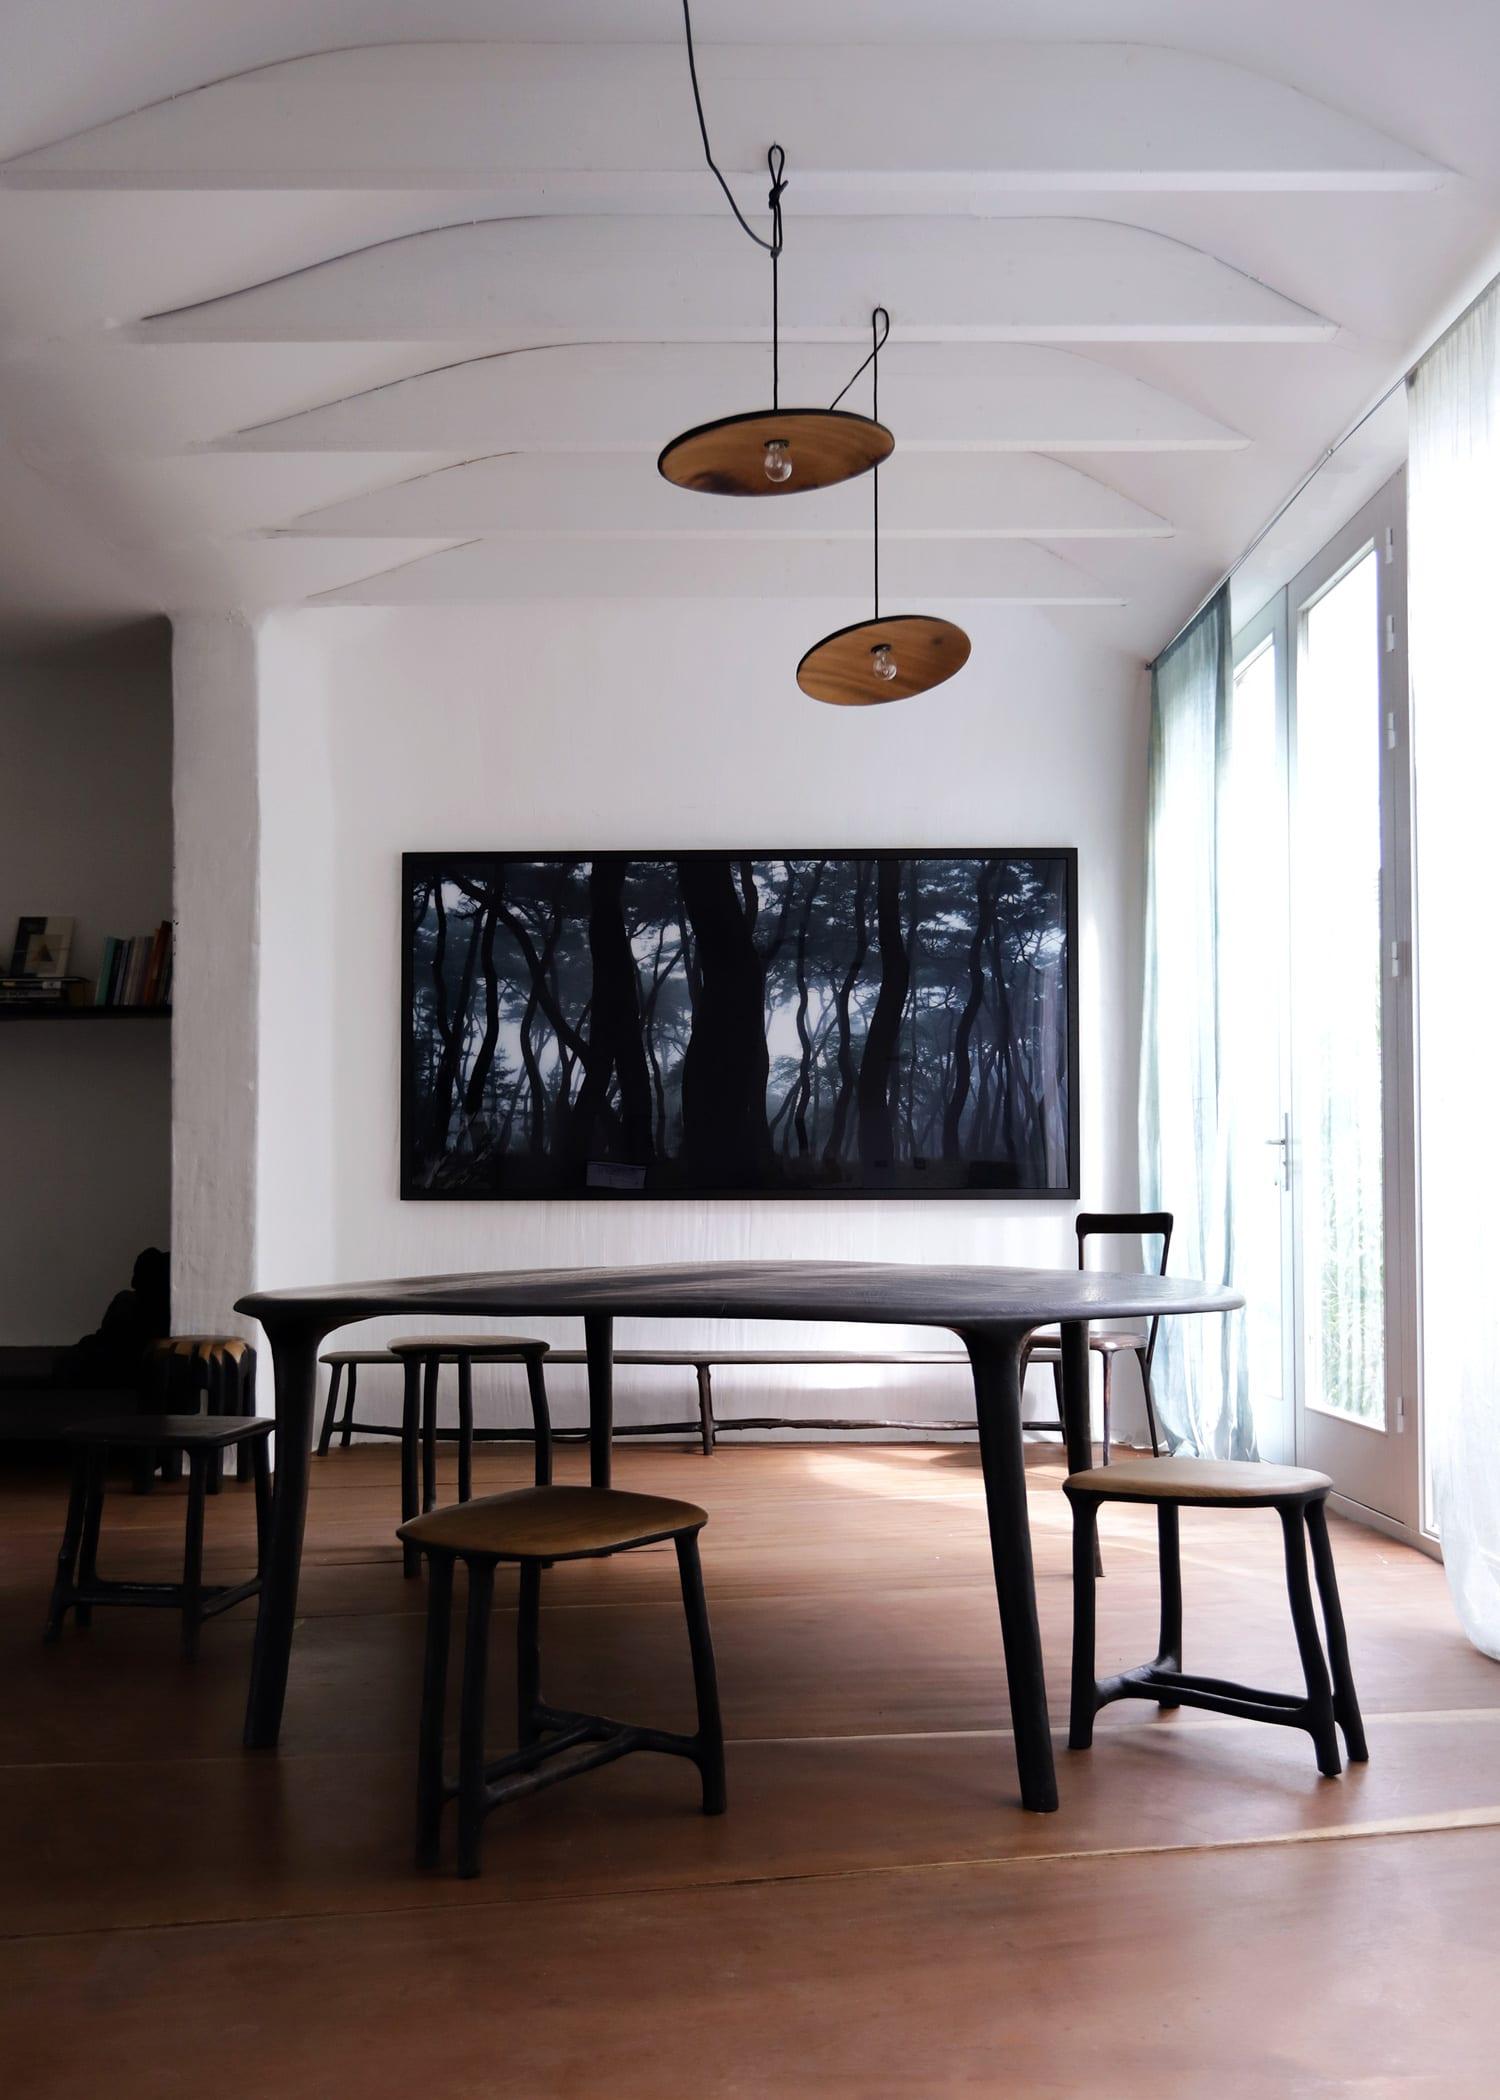 Valentin Loellmann's Extraordinary Pieces & Workshop in Maastricht, The Netherlands | Yellowtrace